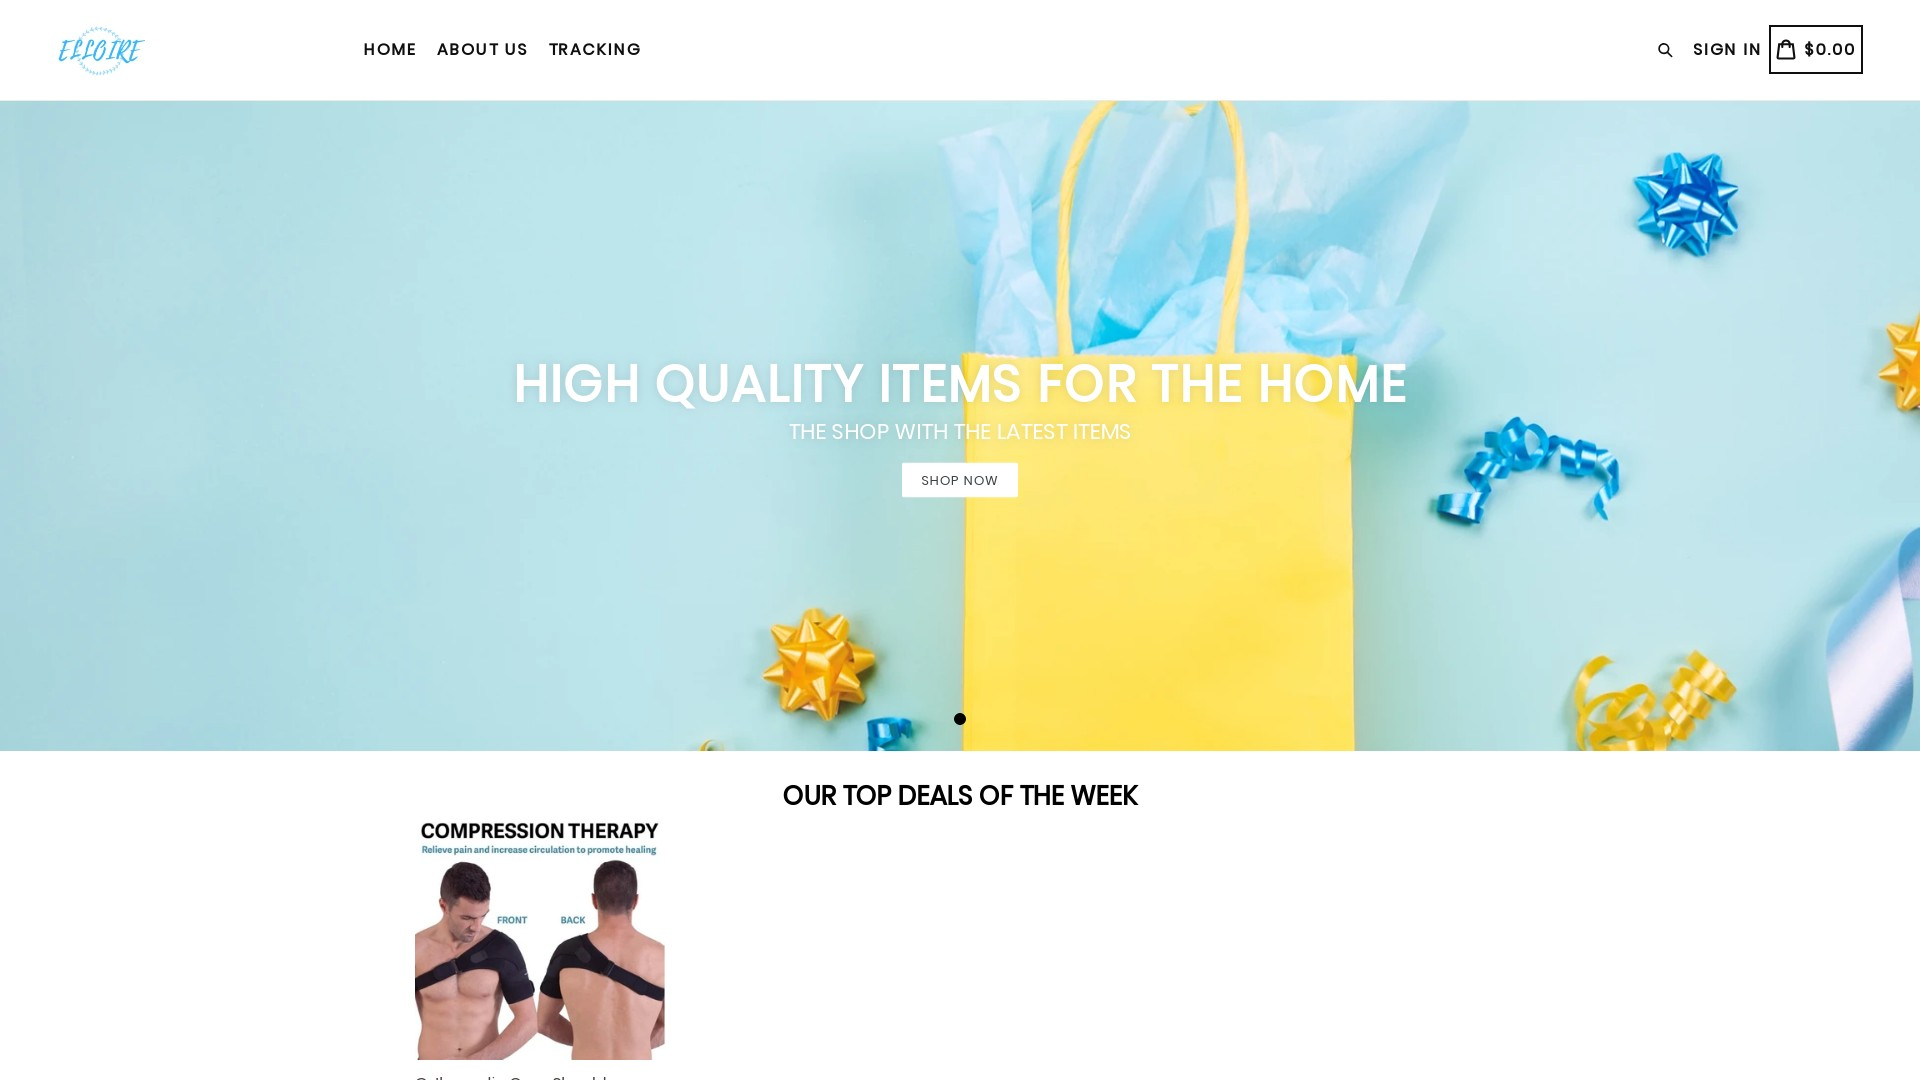 Is Elloire a Scam or an Untrustworthy Online Store?